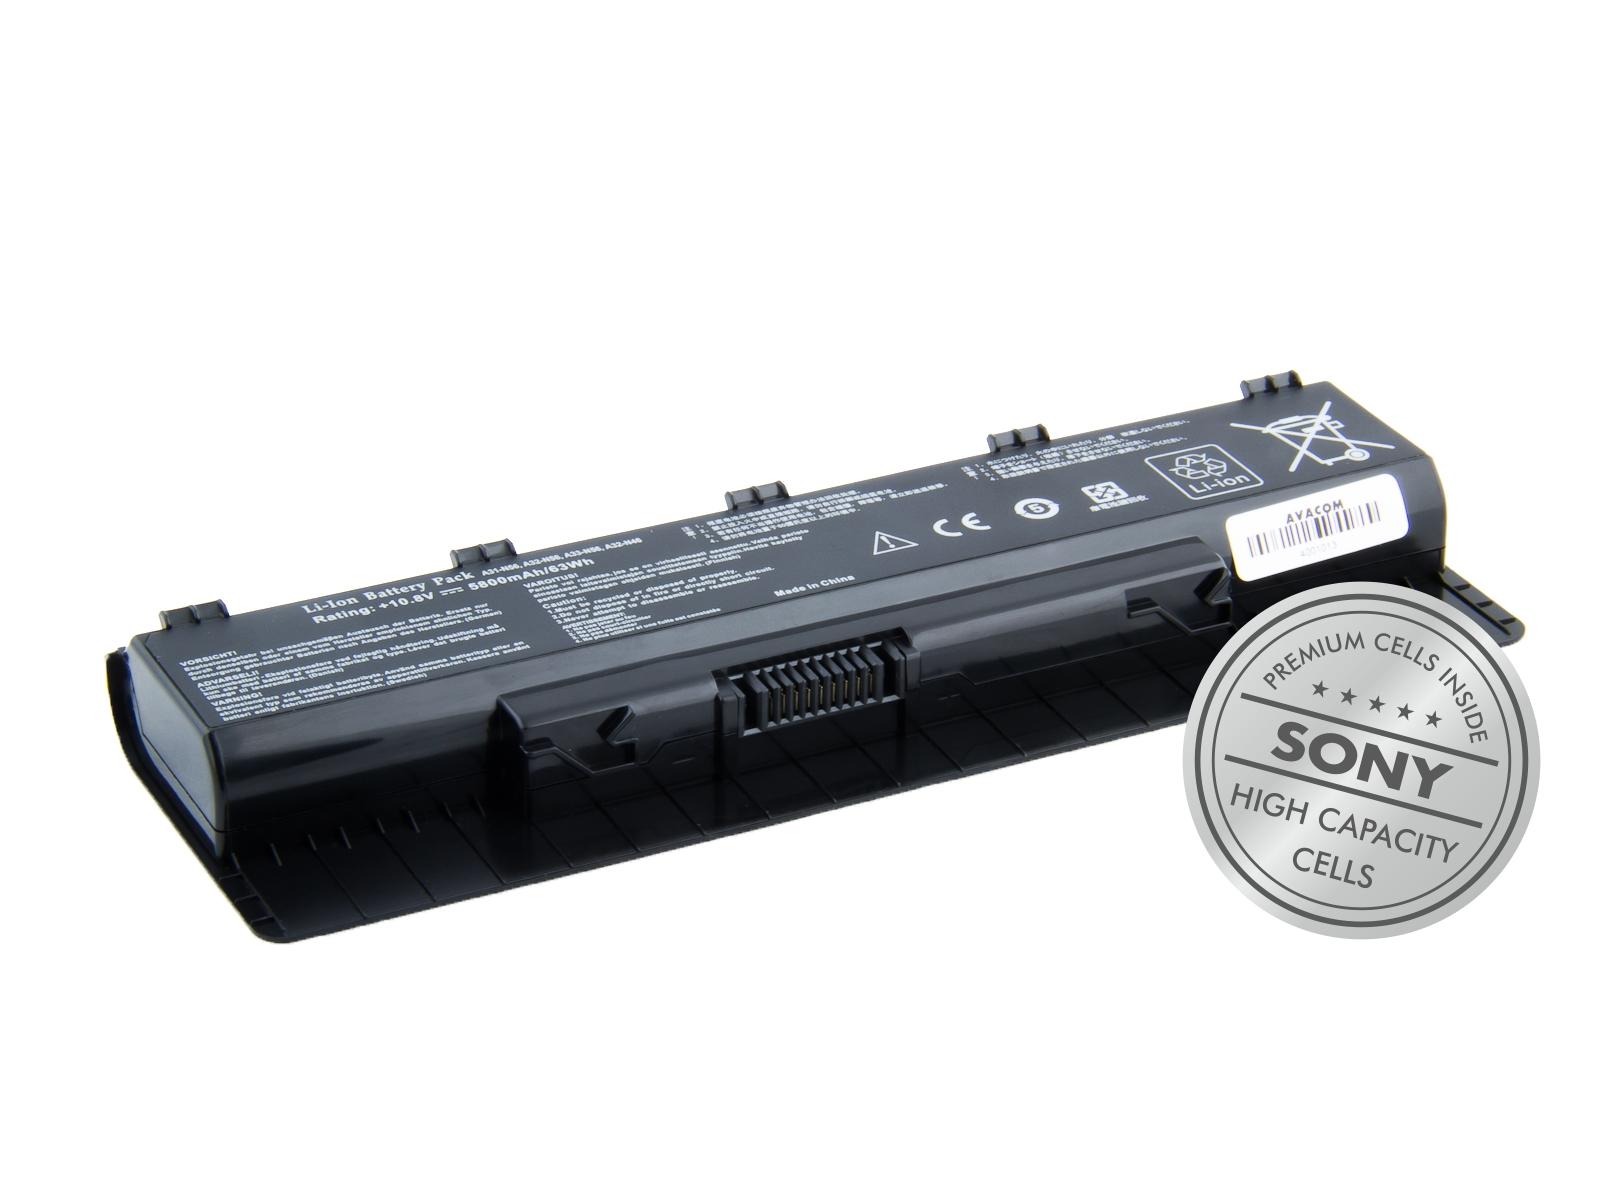 Baterie AVACOM NOAS-N56-S29 pro Asus N46, N56, N76 series A32-N56 Li-Ion 10,8V 5800mAh/63Wh black